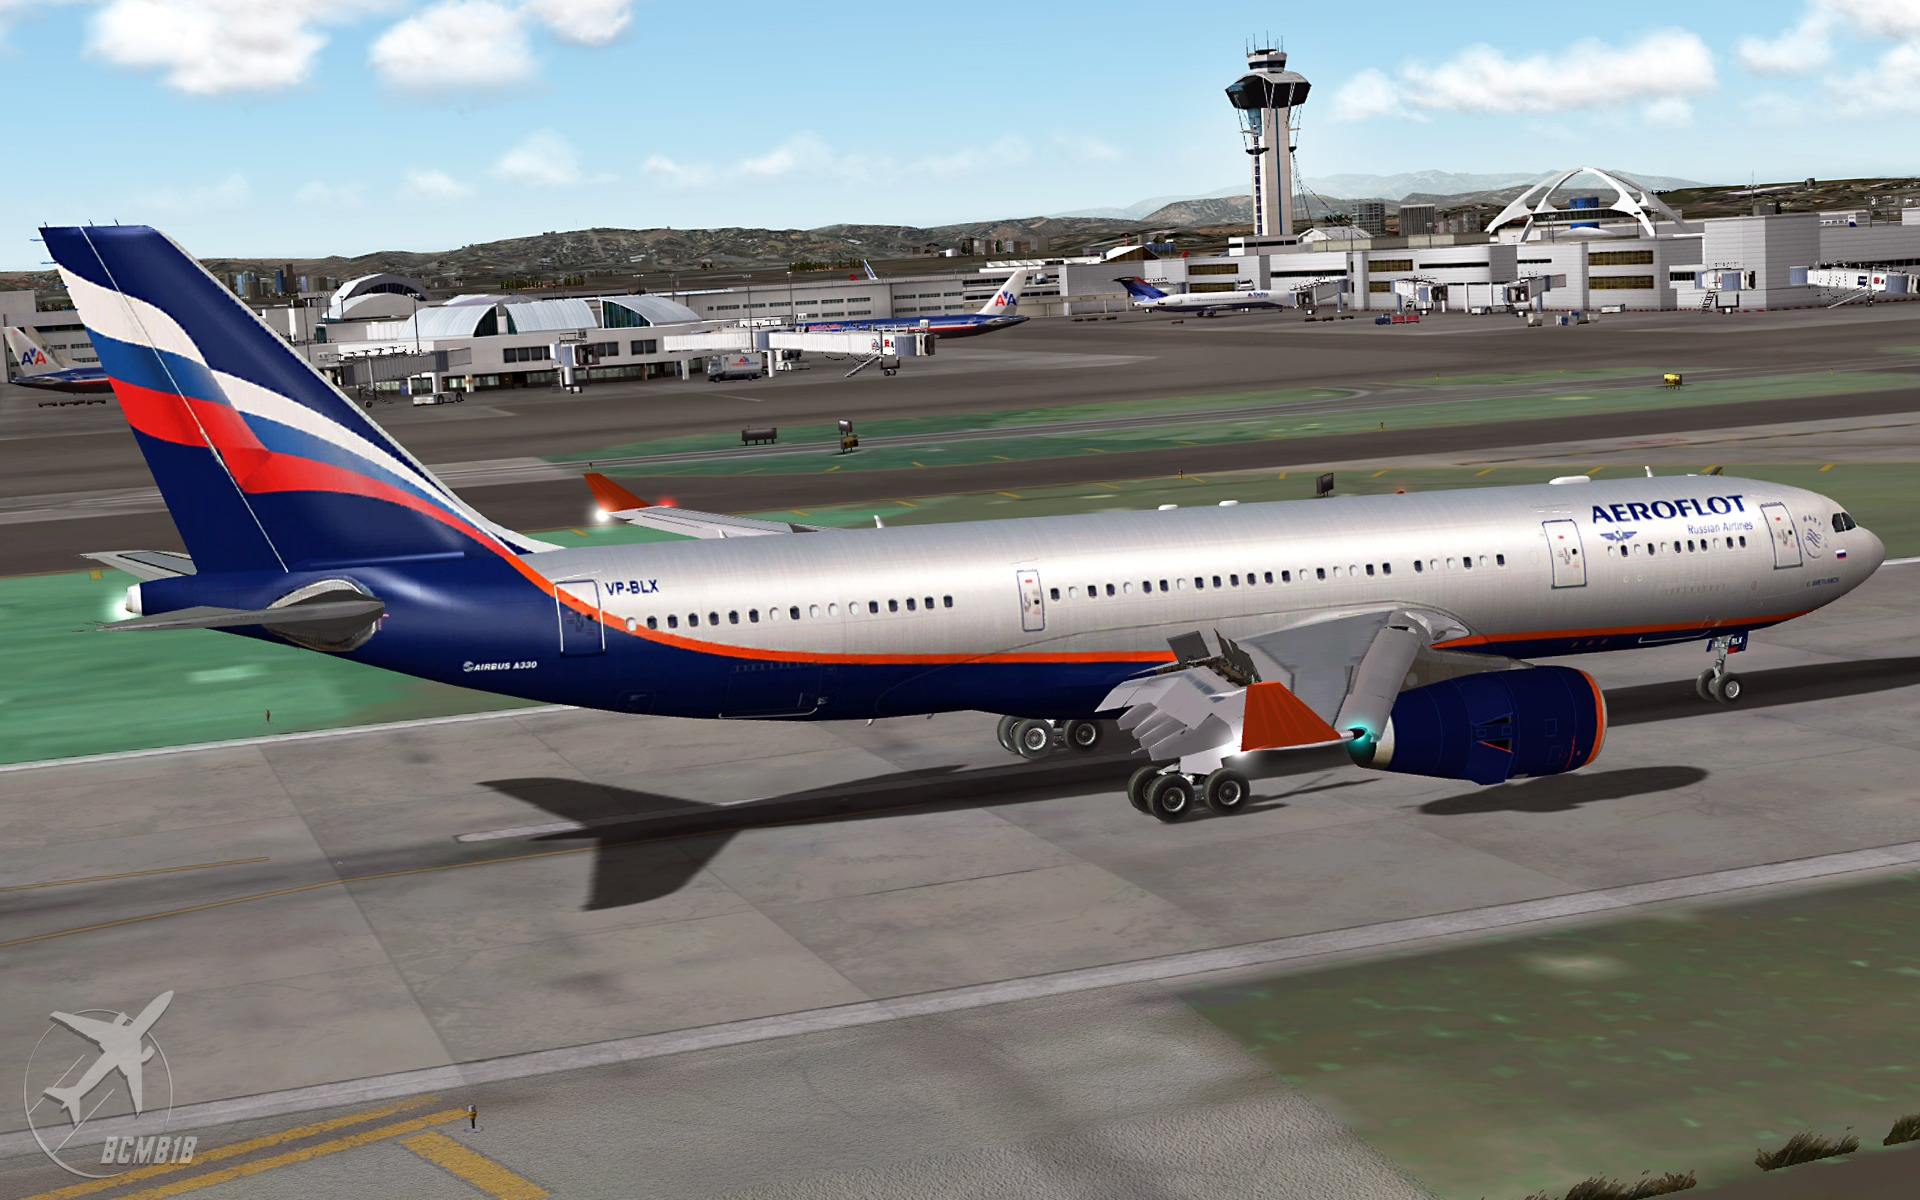 Aeroflot A330 RR - Aircraft Skins - Liveries - X-Plane Org Forum